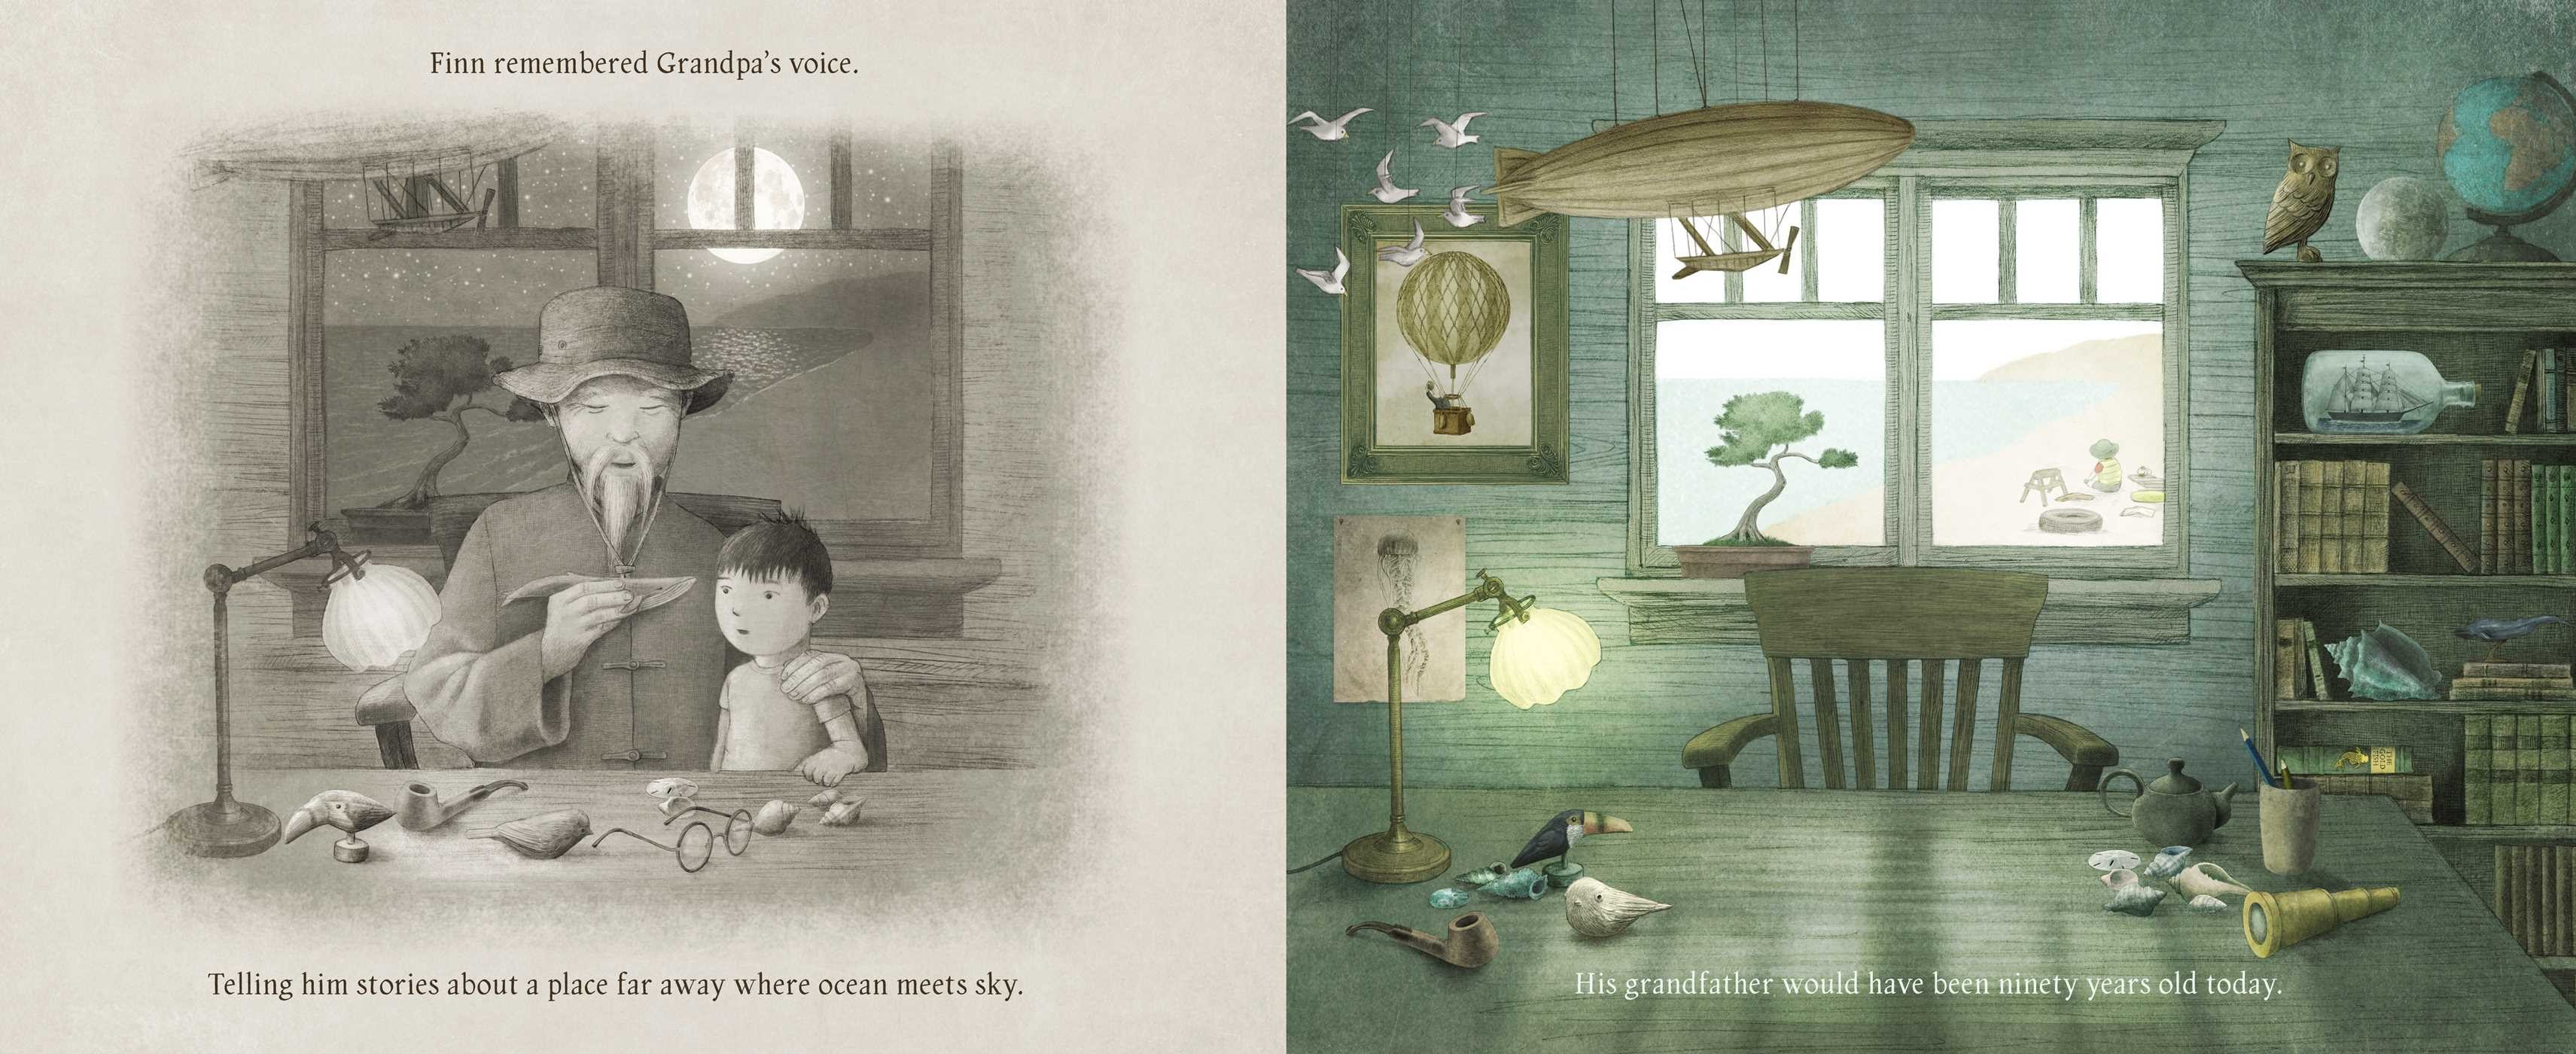 celebrate-picture-books-picture-book-review-ocean-meets-sky-grandpa's-voice